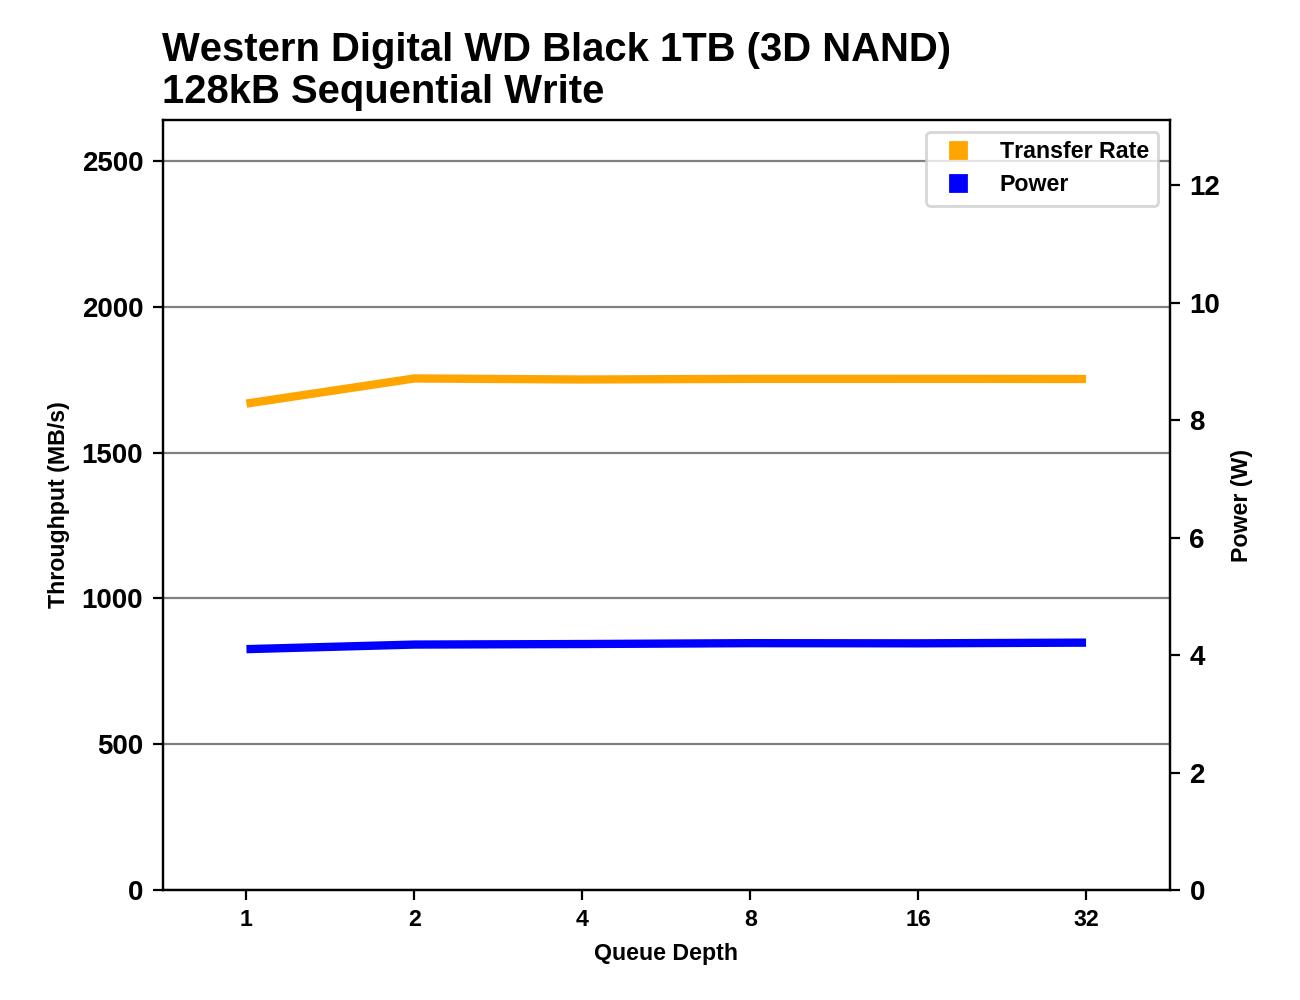 Обзор Western Digital WD Black 3D NAND SSD: EVO встретил равного - 95